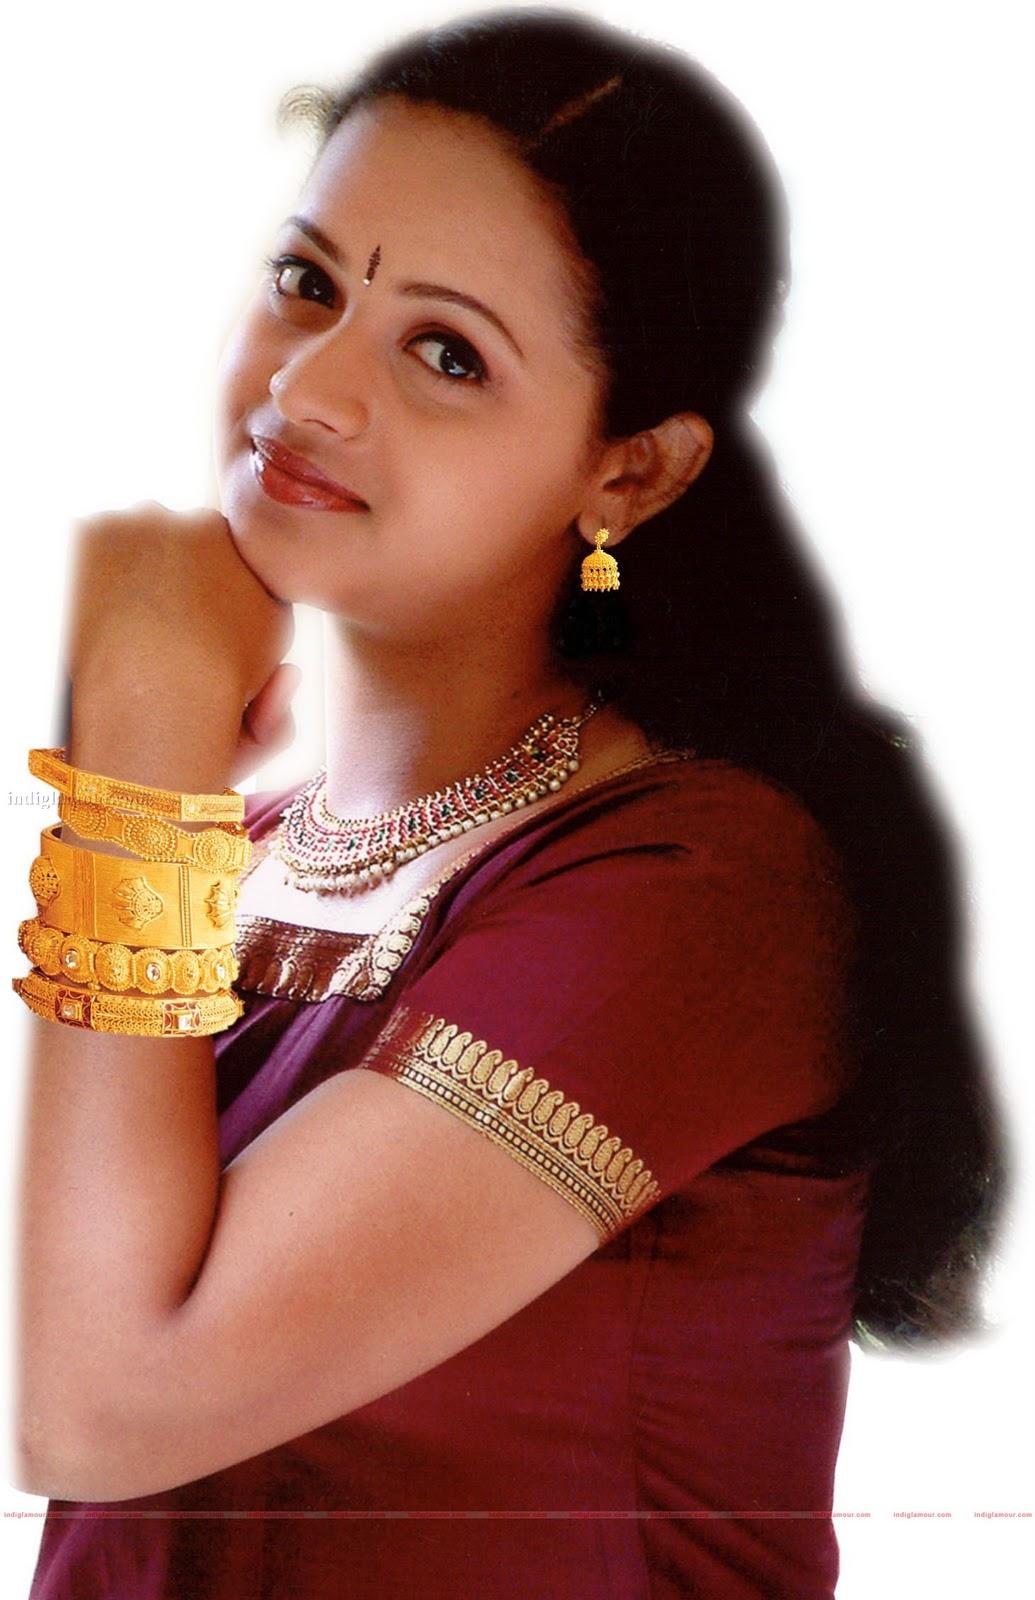 http://2.bp.blogspot.com/-vvtH4oiH6Kc/TxcXMTZlhzI/AAAAAAAAHvQ/lHWka3wYFVQ/s1600/Malayalam+Actress+Cute+Bhavana+beautiful.jpg